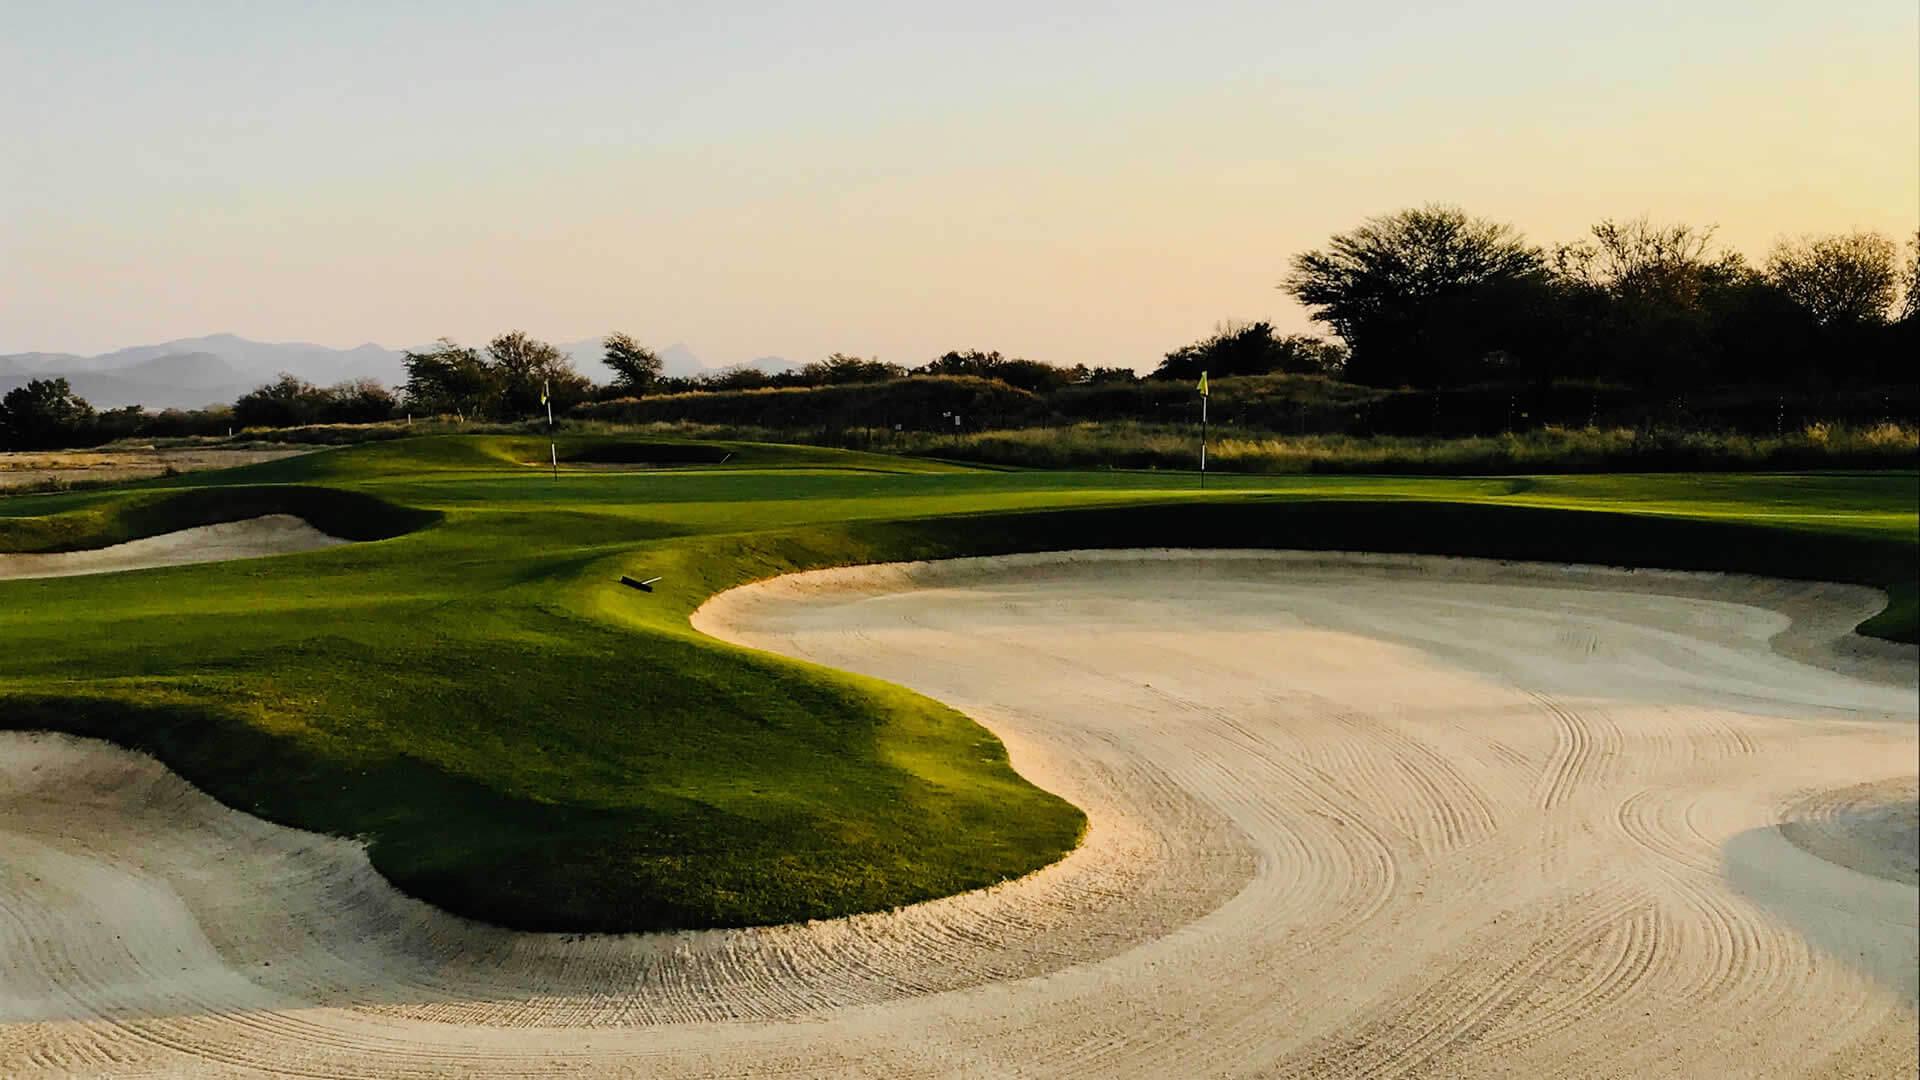 Sandy Golf Course